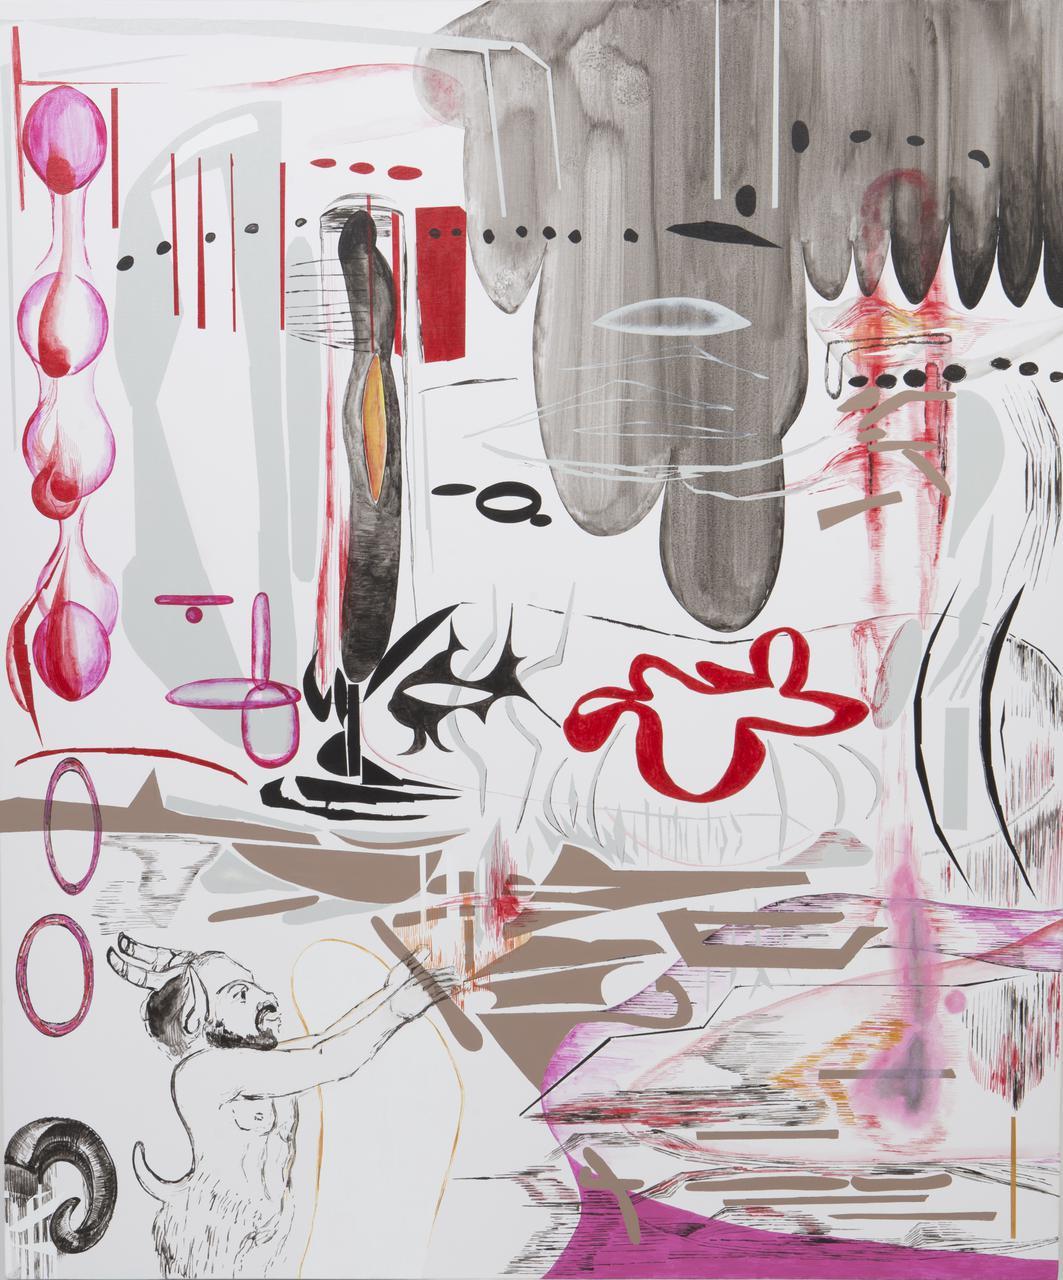 Vana Fertaki, Pan, oil and varnishon canvas, 120 x 100 cm, 2017